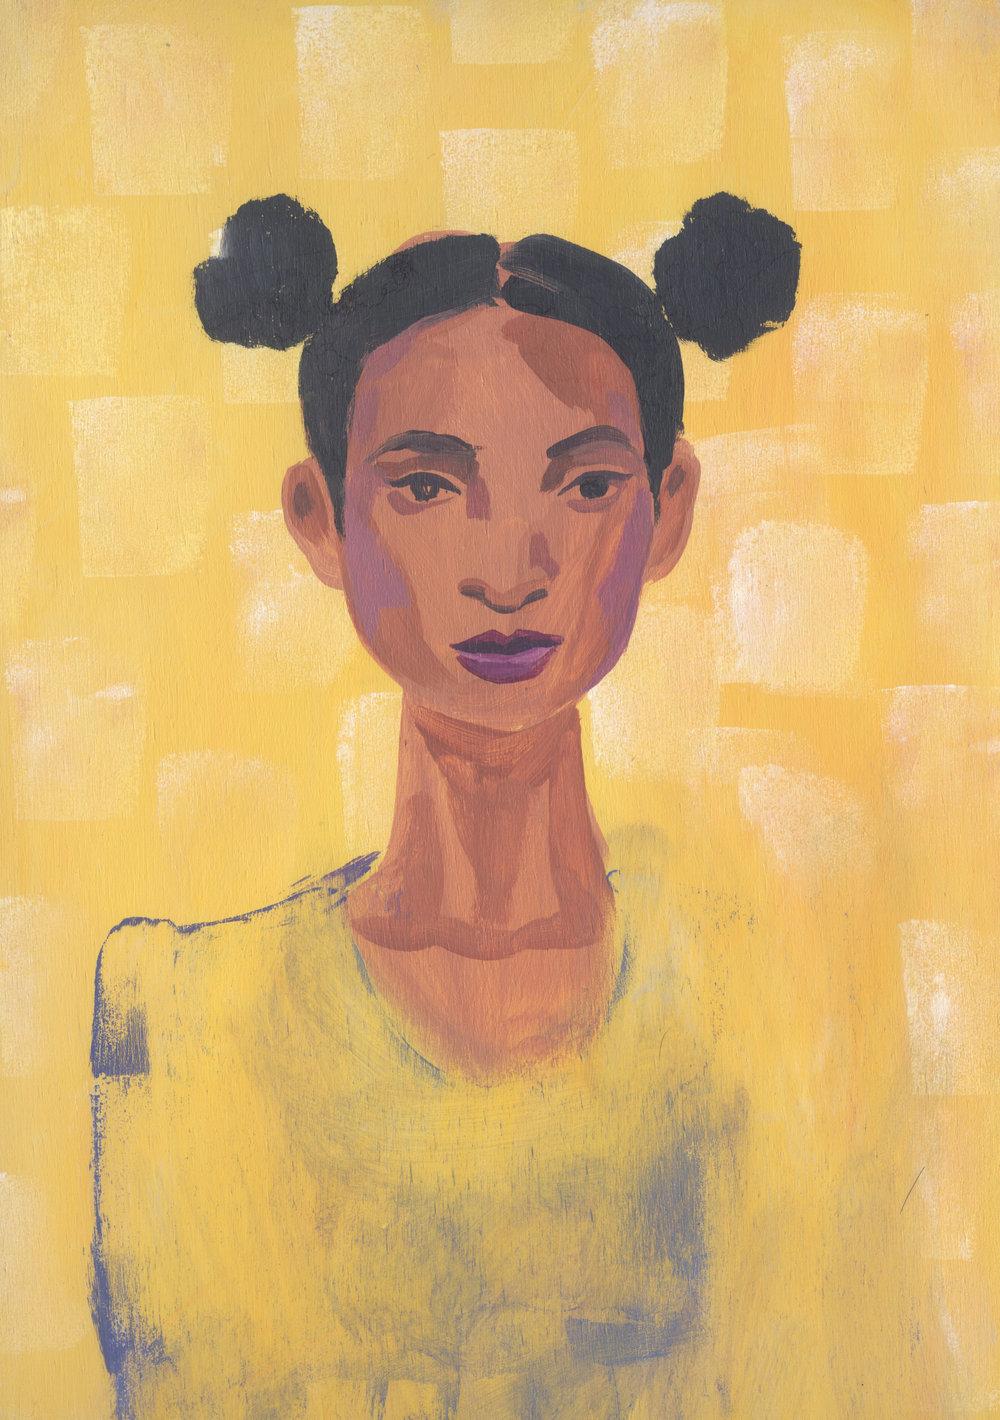 lady-on-yellow.jpg